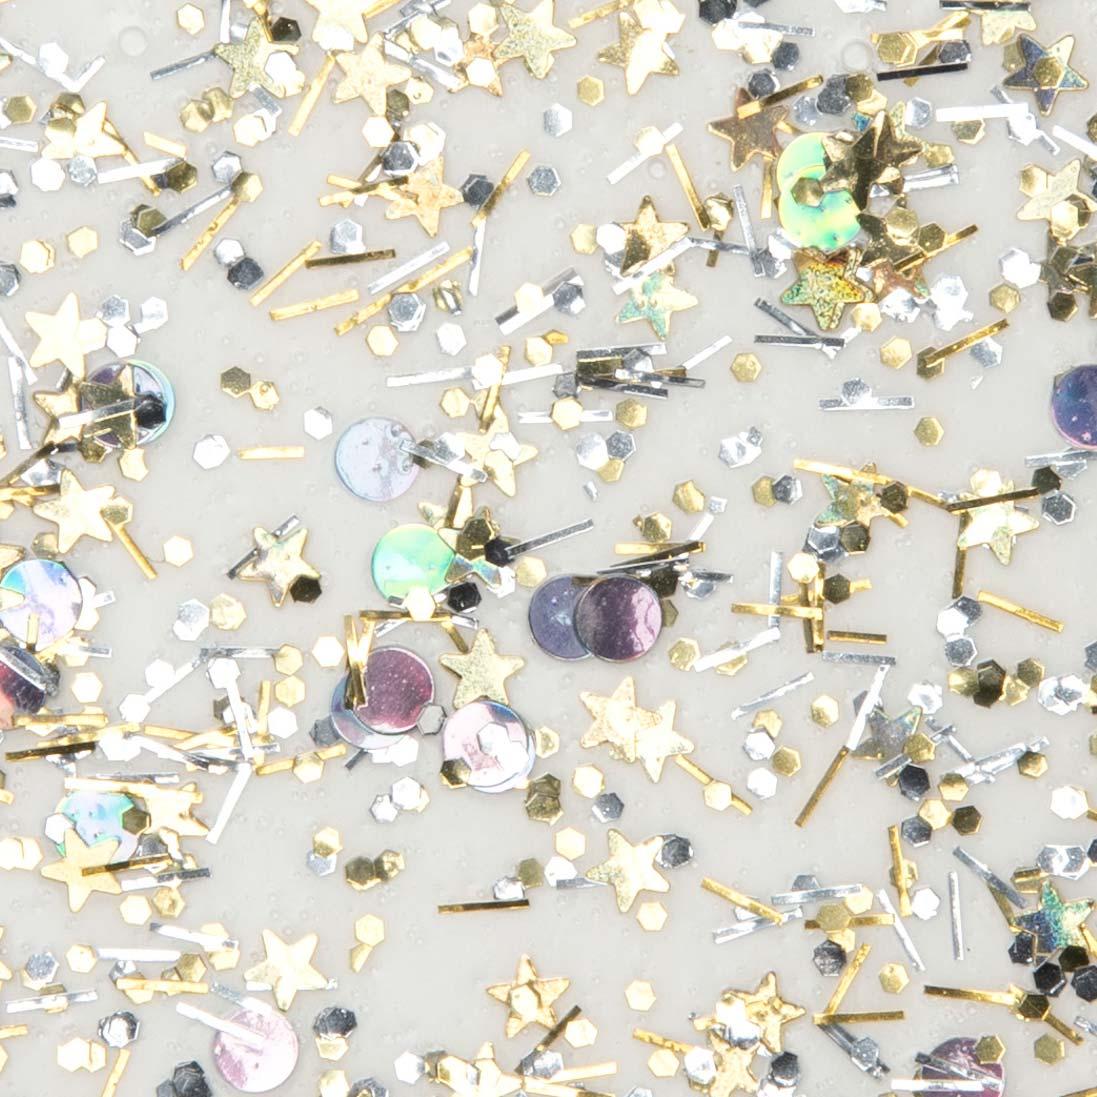 Martha Stewart® 2oz Multi-Surface Confetti Glitter Acrylic Craft Paint - Toast of the Town